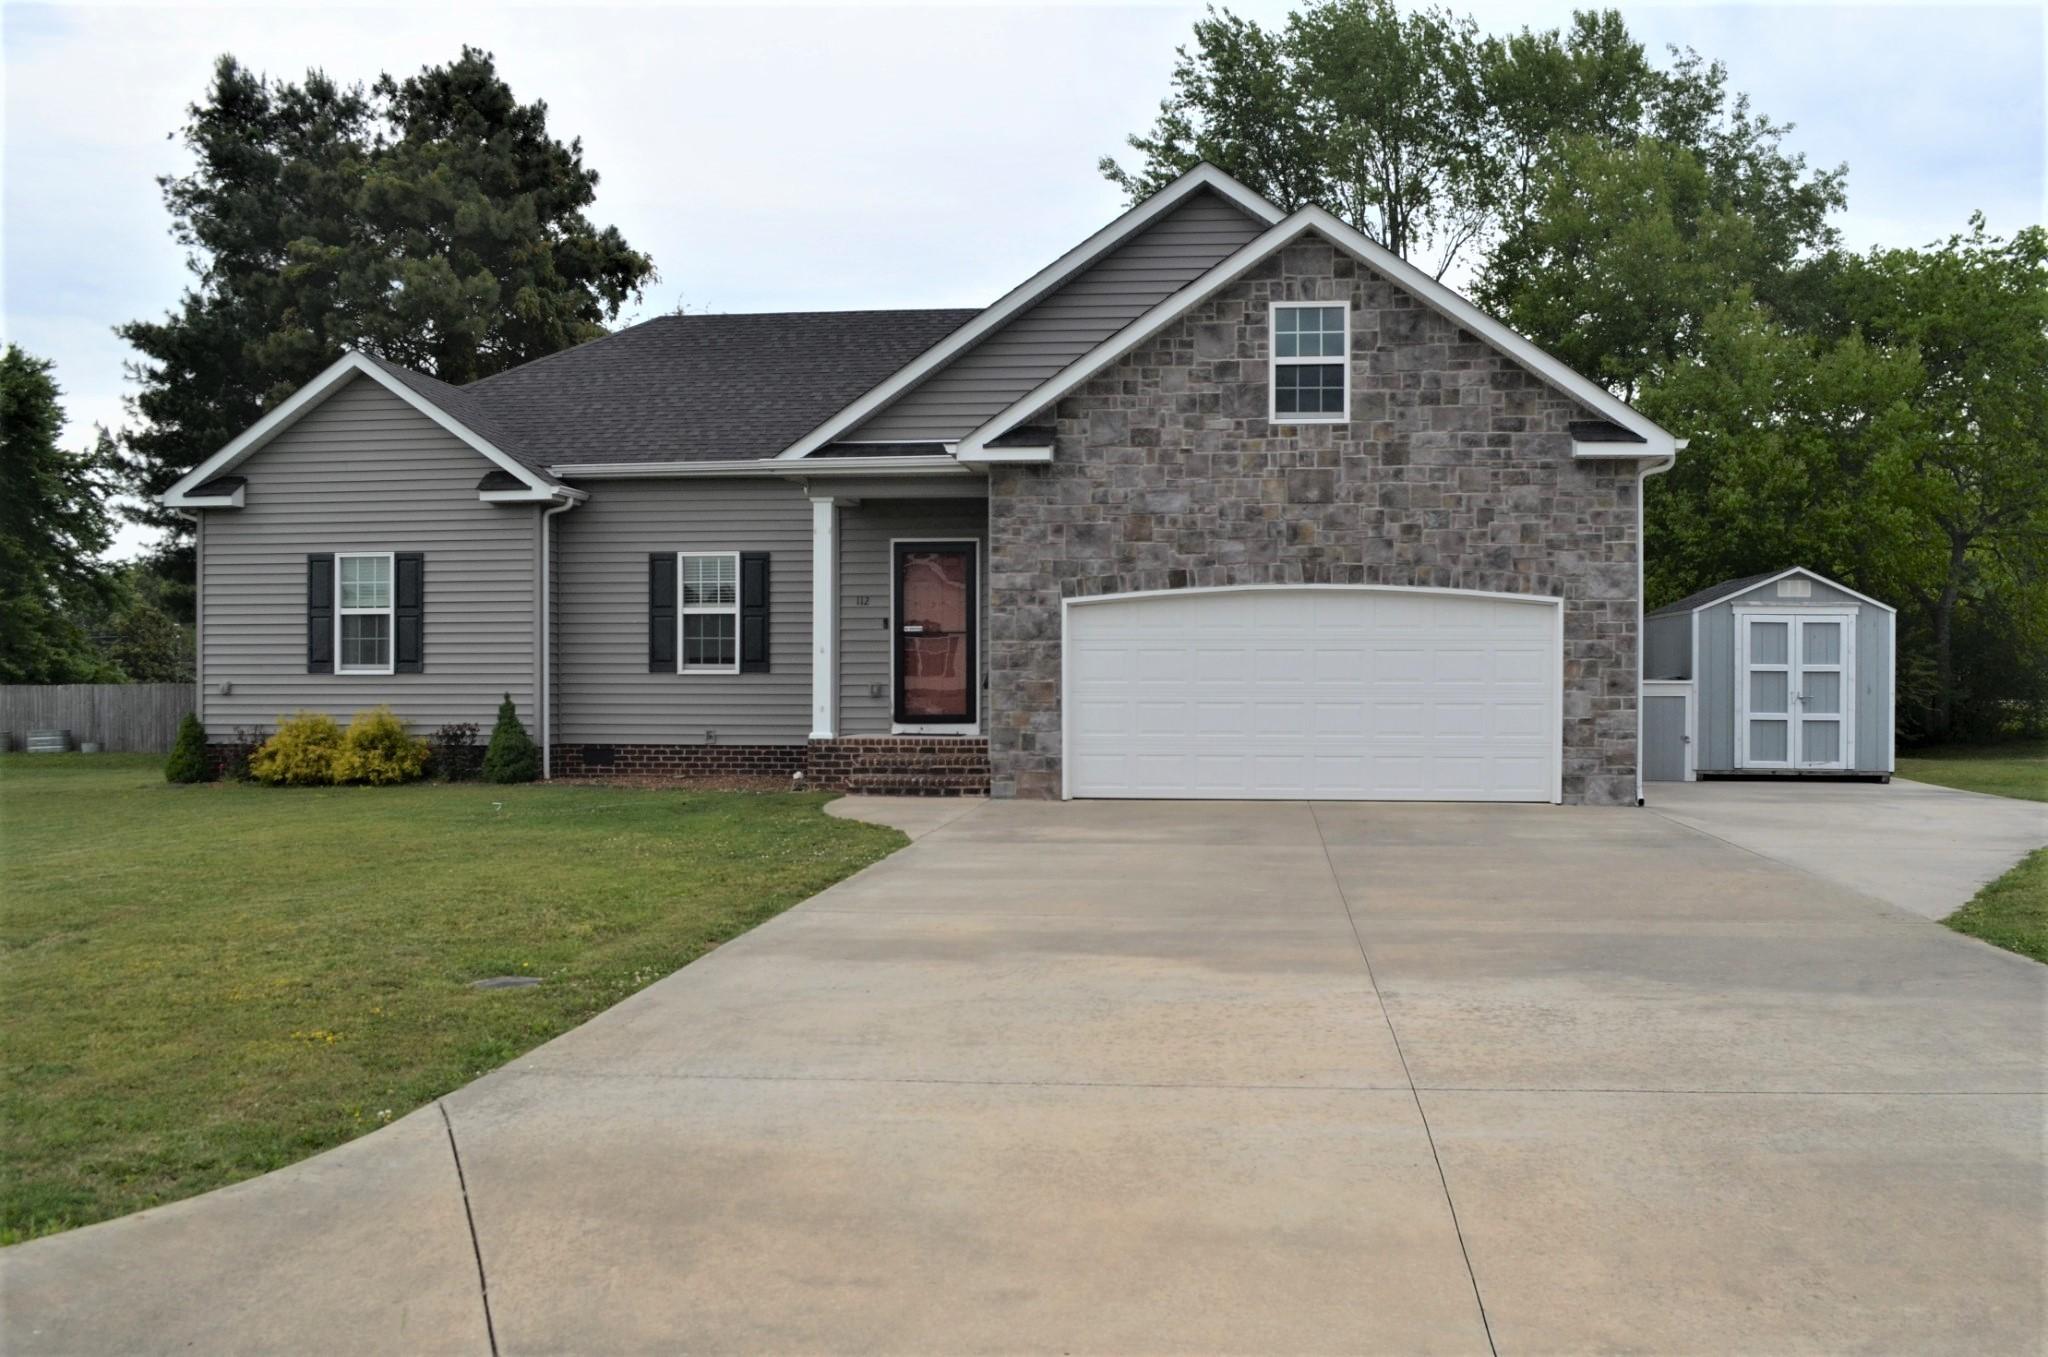 112 ELISE CIR Property Photo - Tullahoma, TN real estate listing